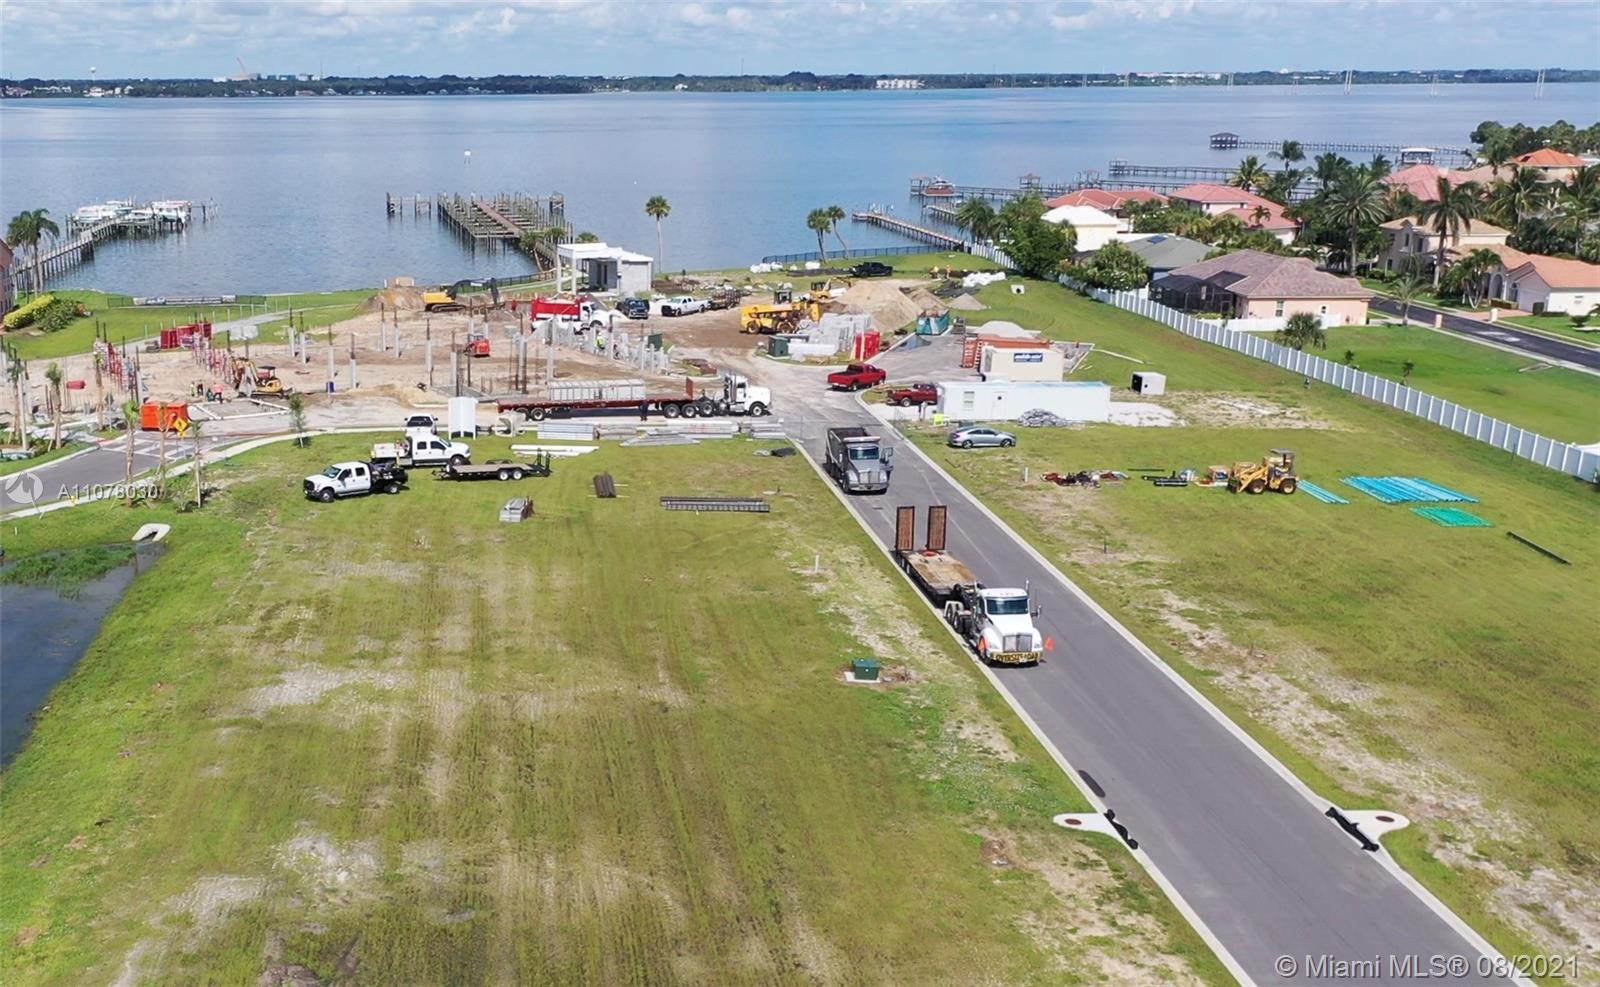 Photo of Harbor Island Beach Club Apt 203